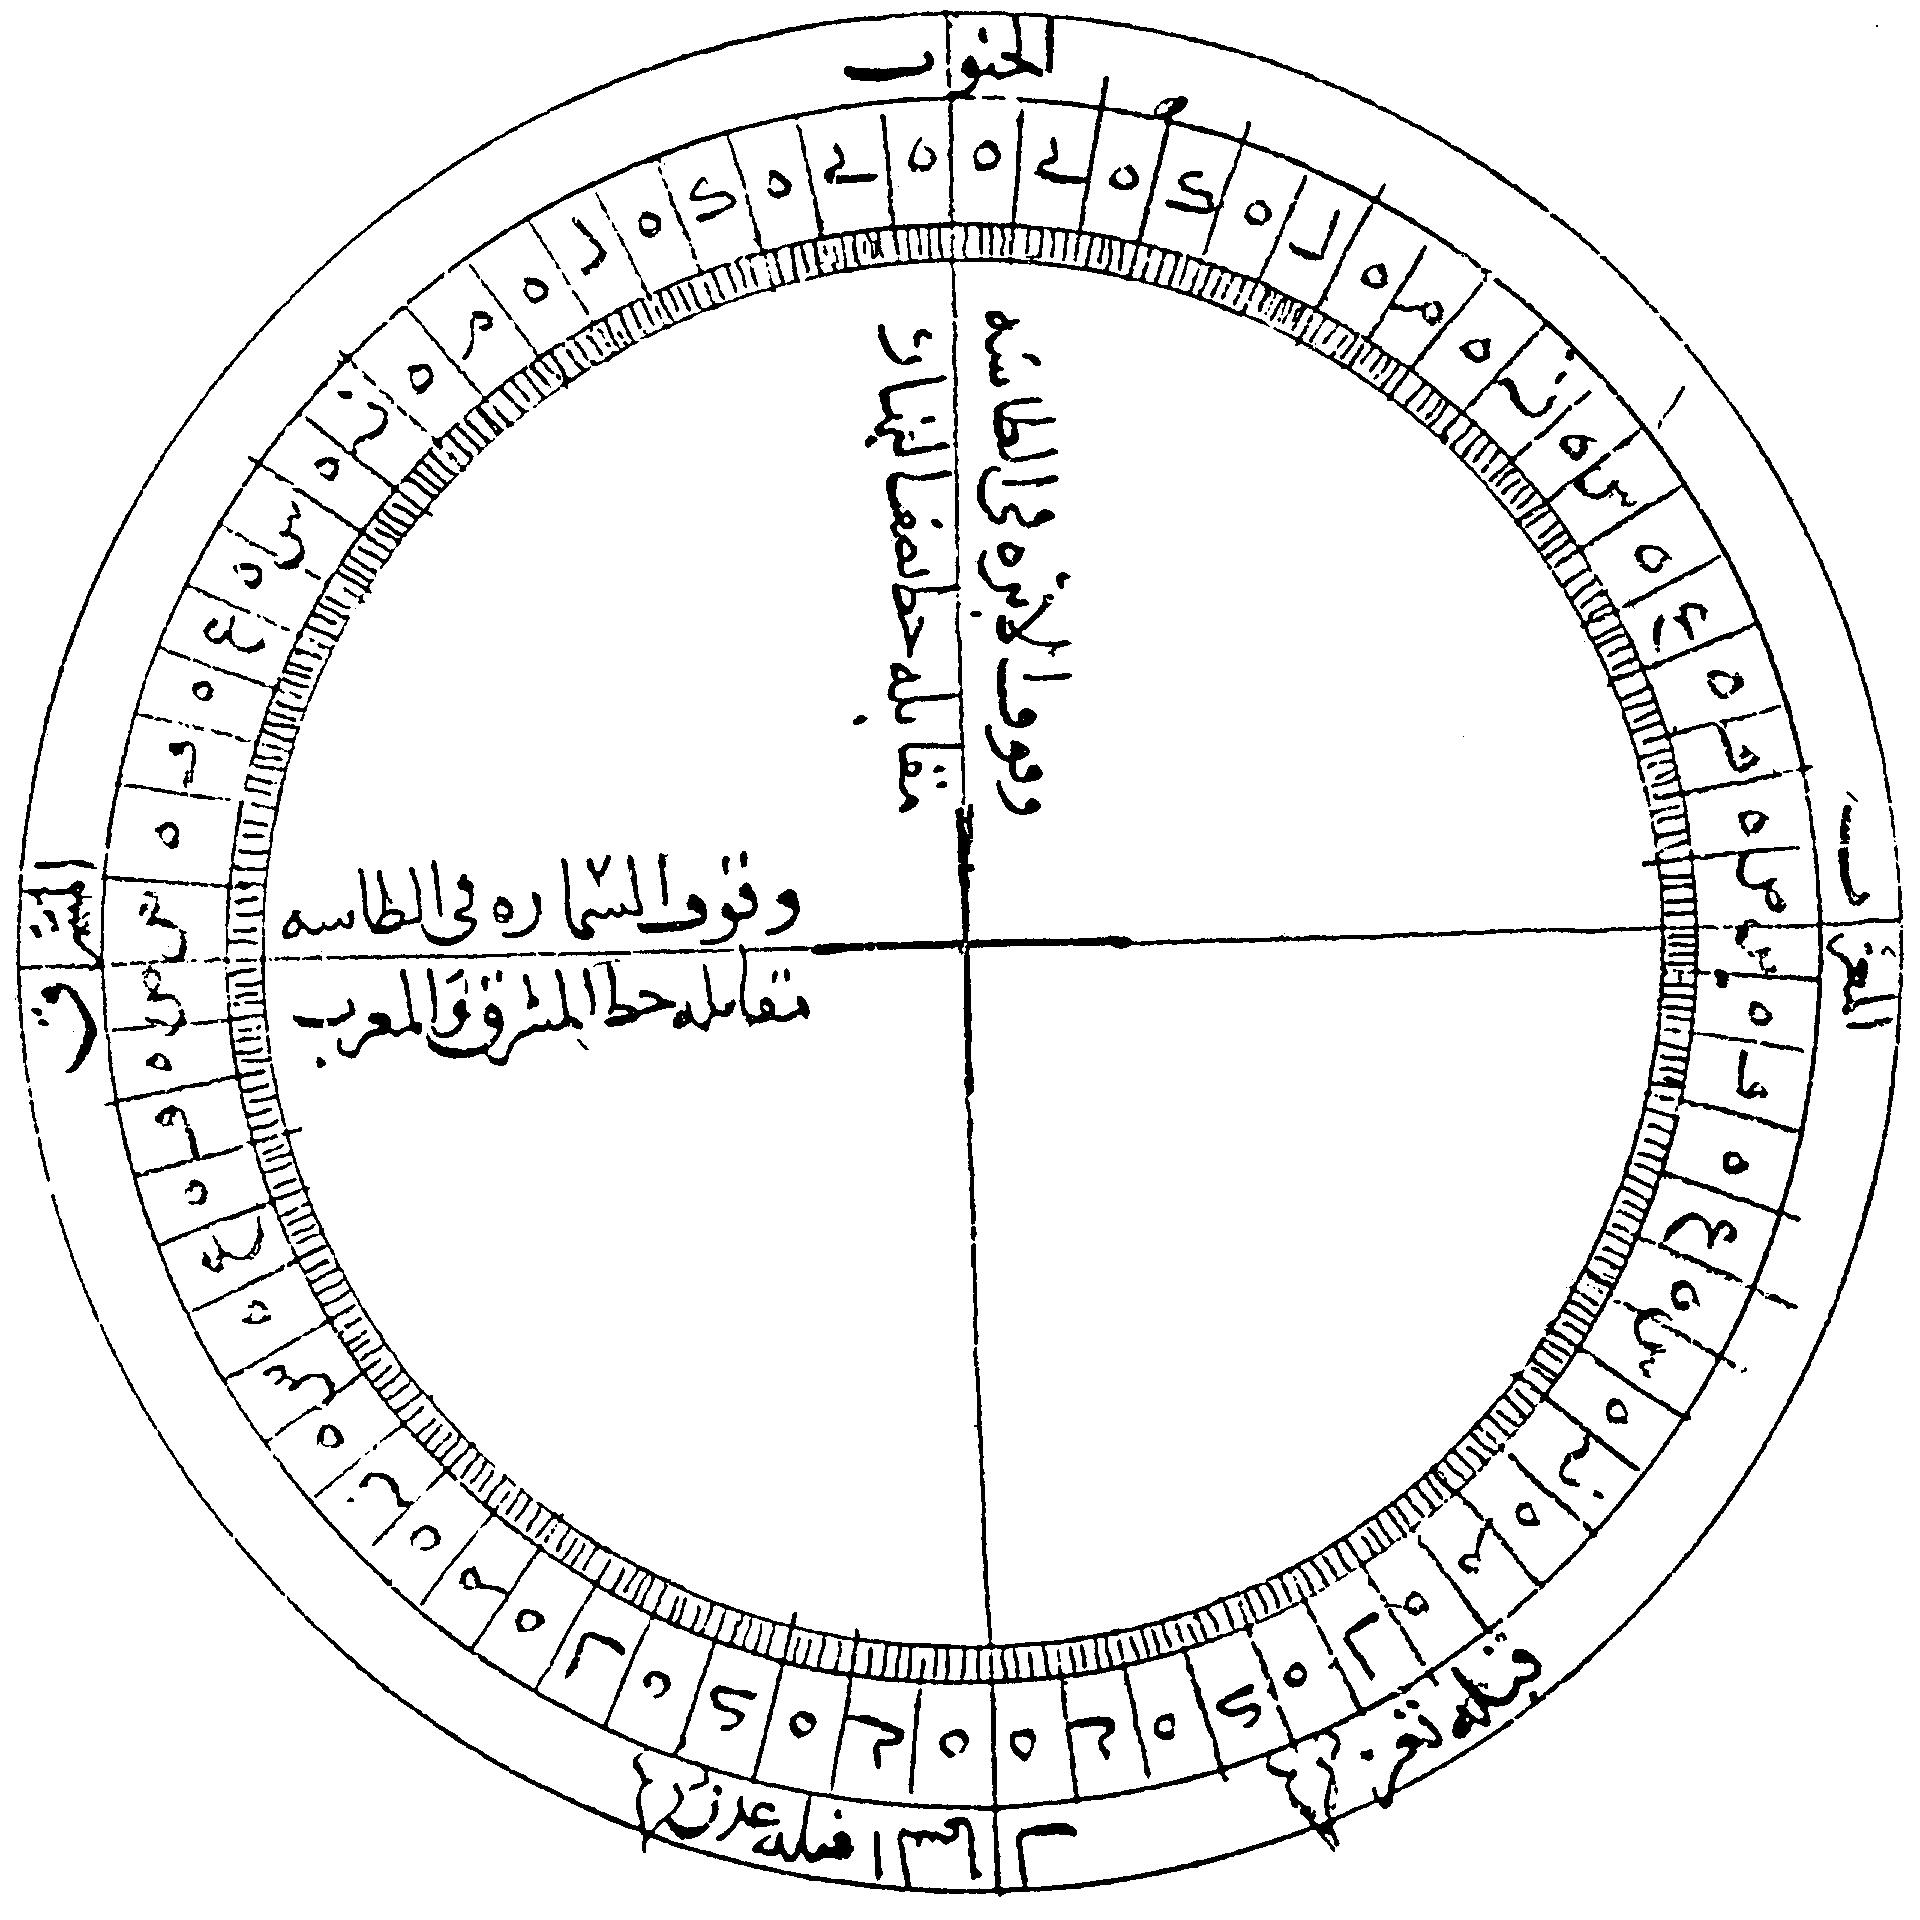 Fileal ashraf compass and qibla diagramg wikimedia commons fileal ashraf compass and qibla diagramg pooptronica